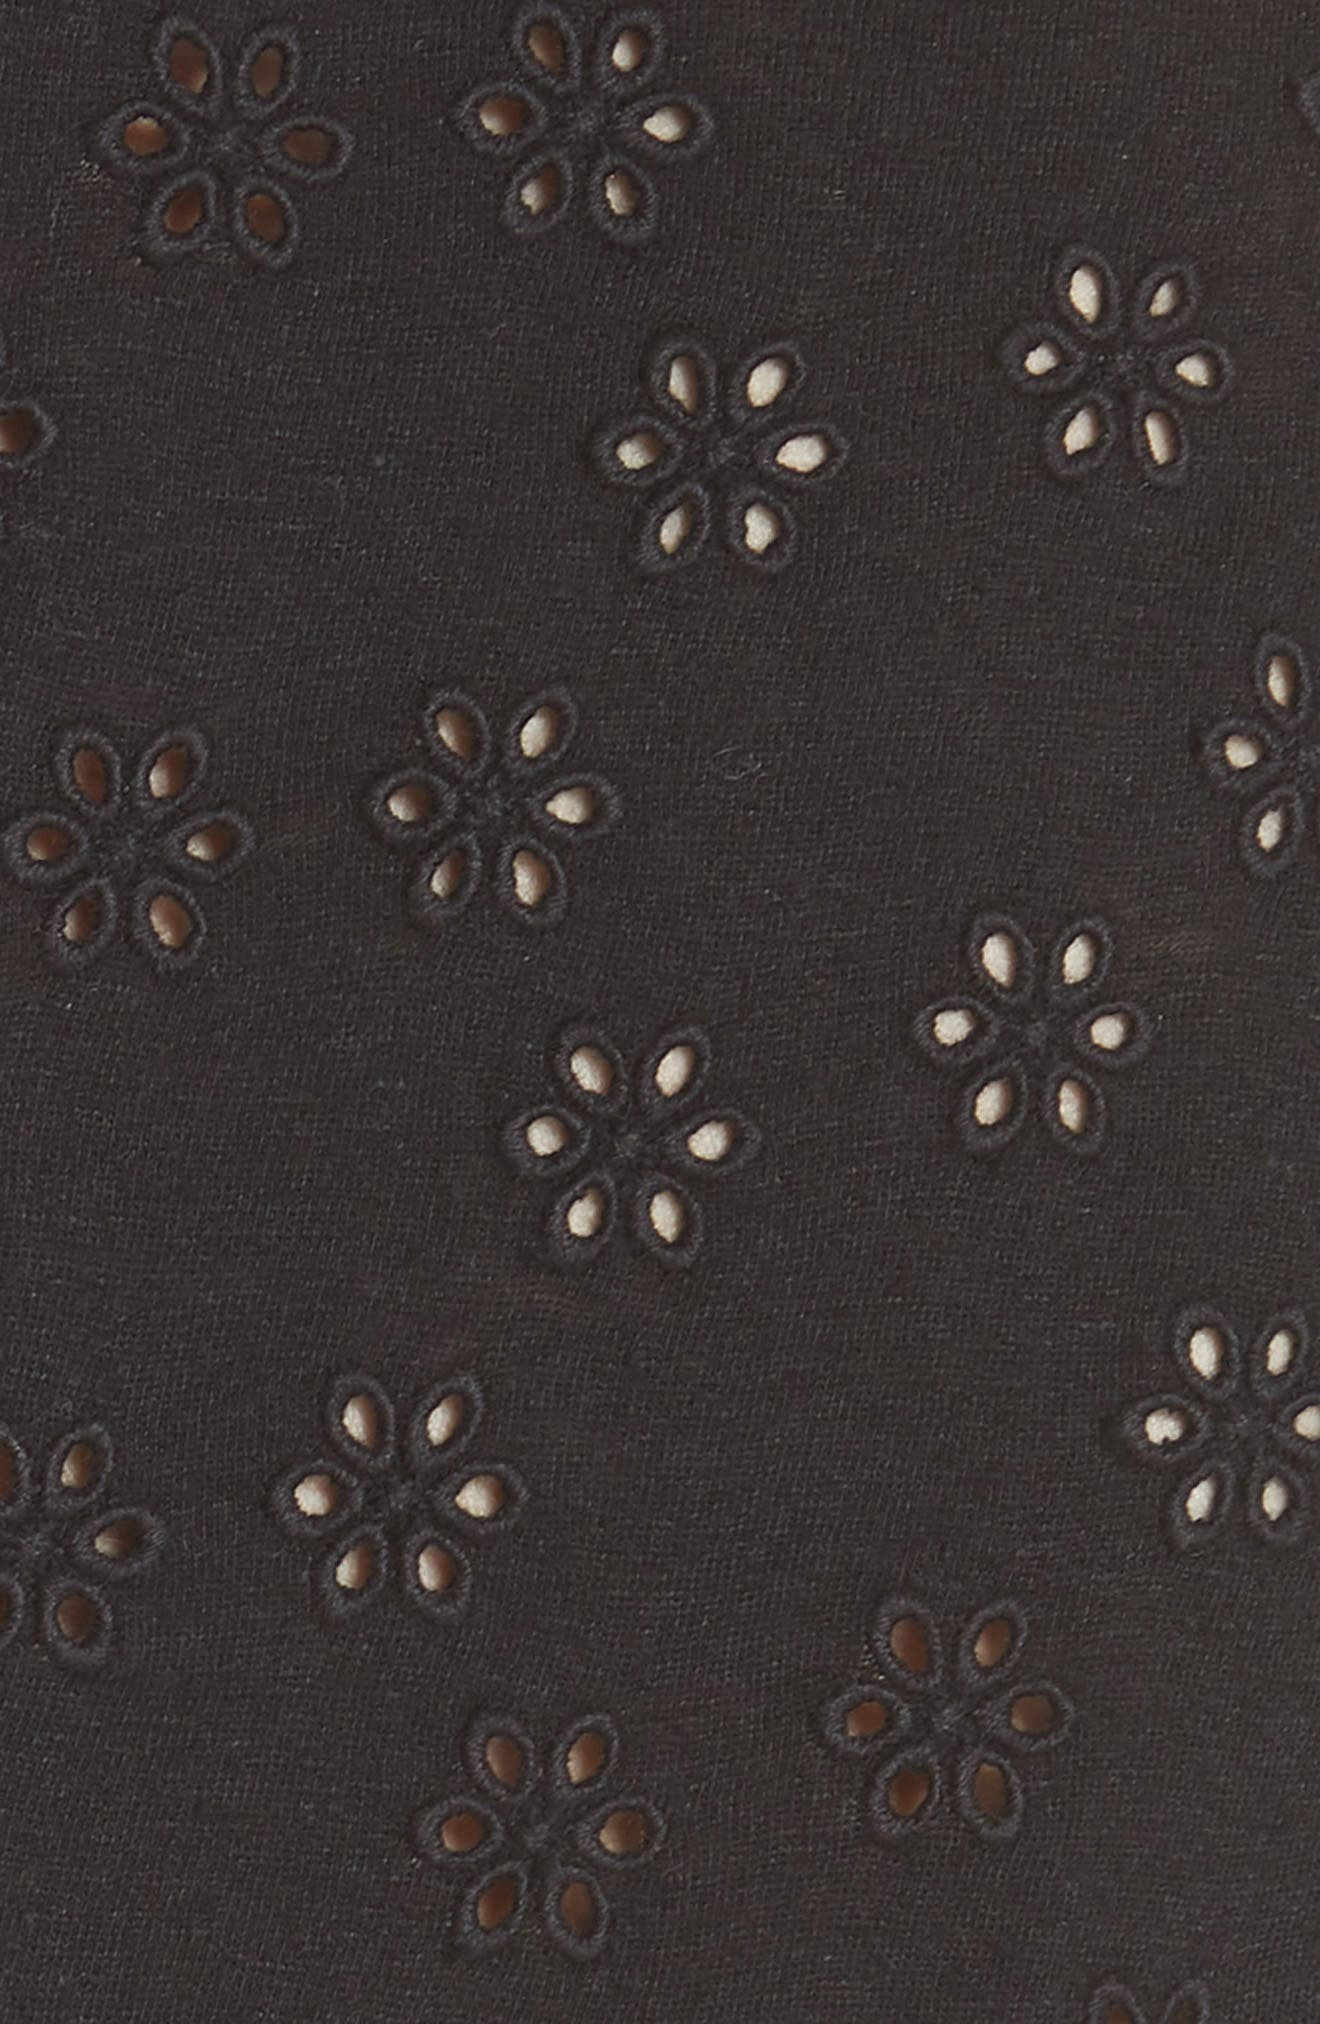 LA VIE REBECCA TAYLOR, Linen Cotton Eyelet Tank Top, Alternate thumbnail 5, color, 001